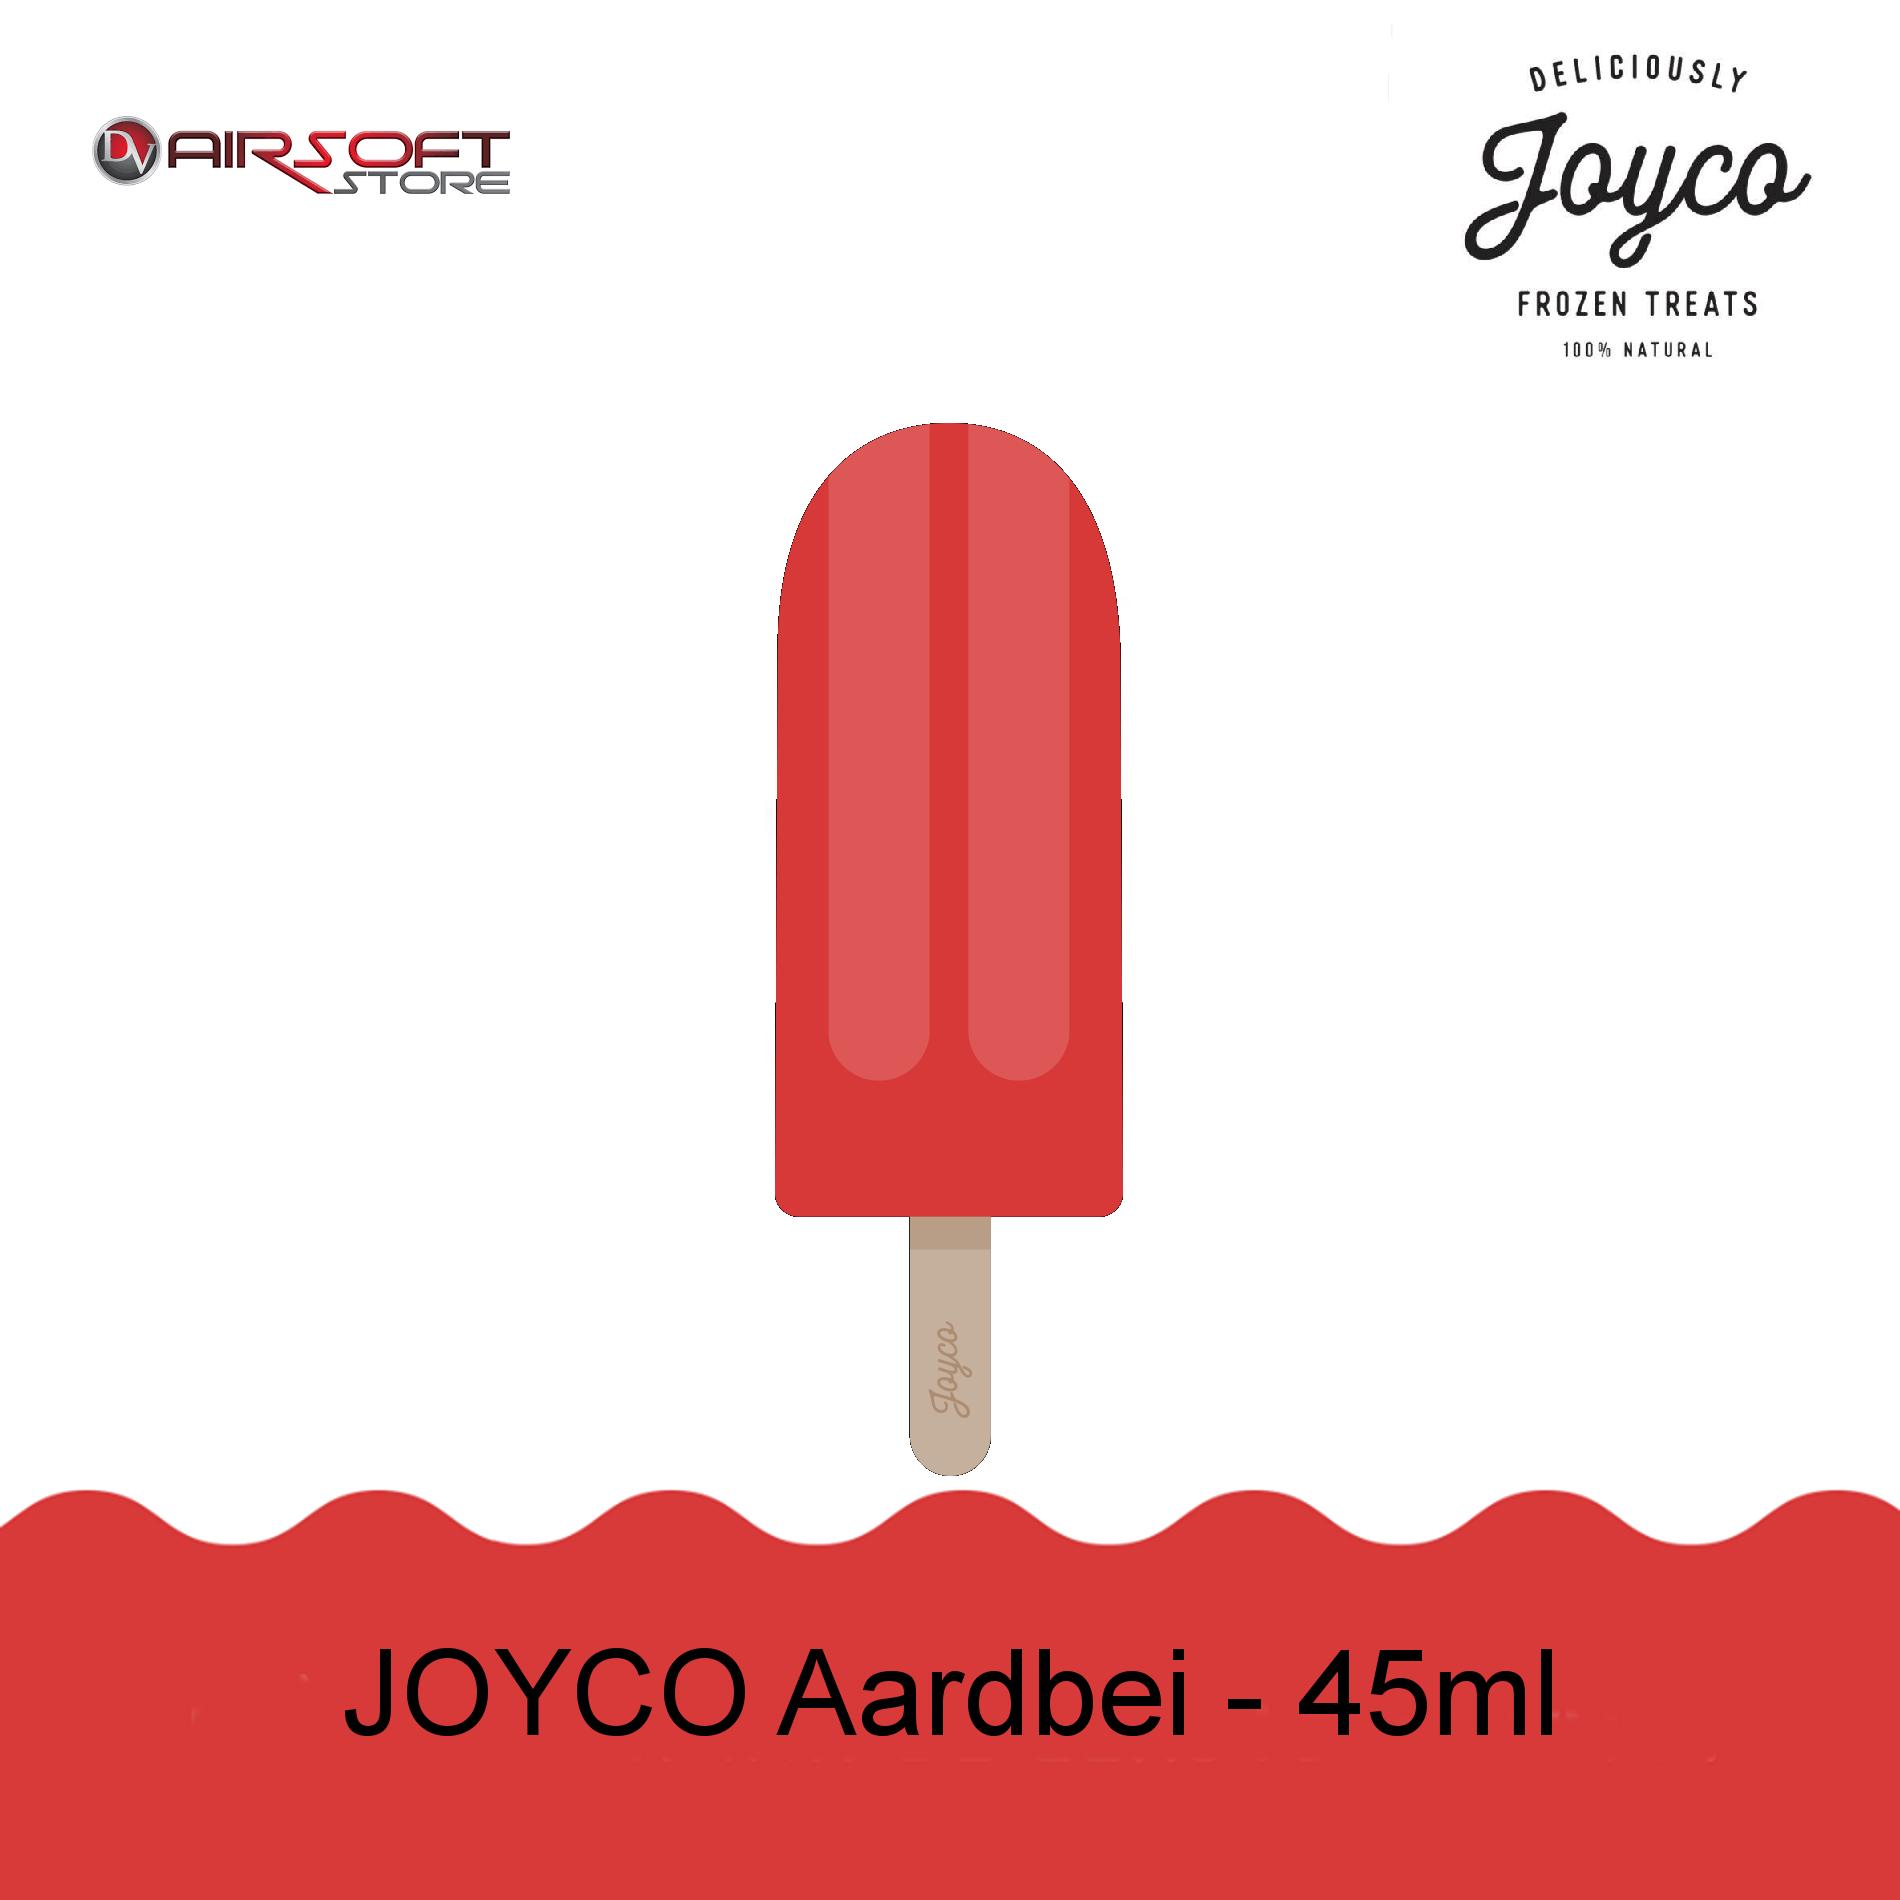 Joyco Joyco Aardbei - 45ml